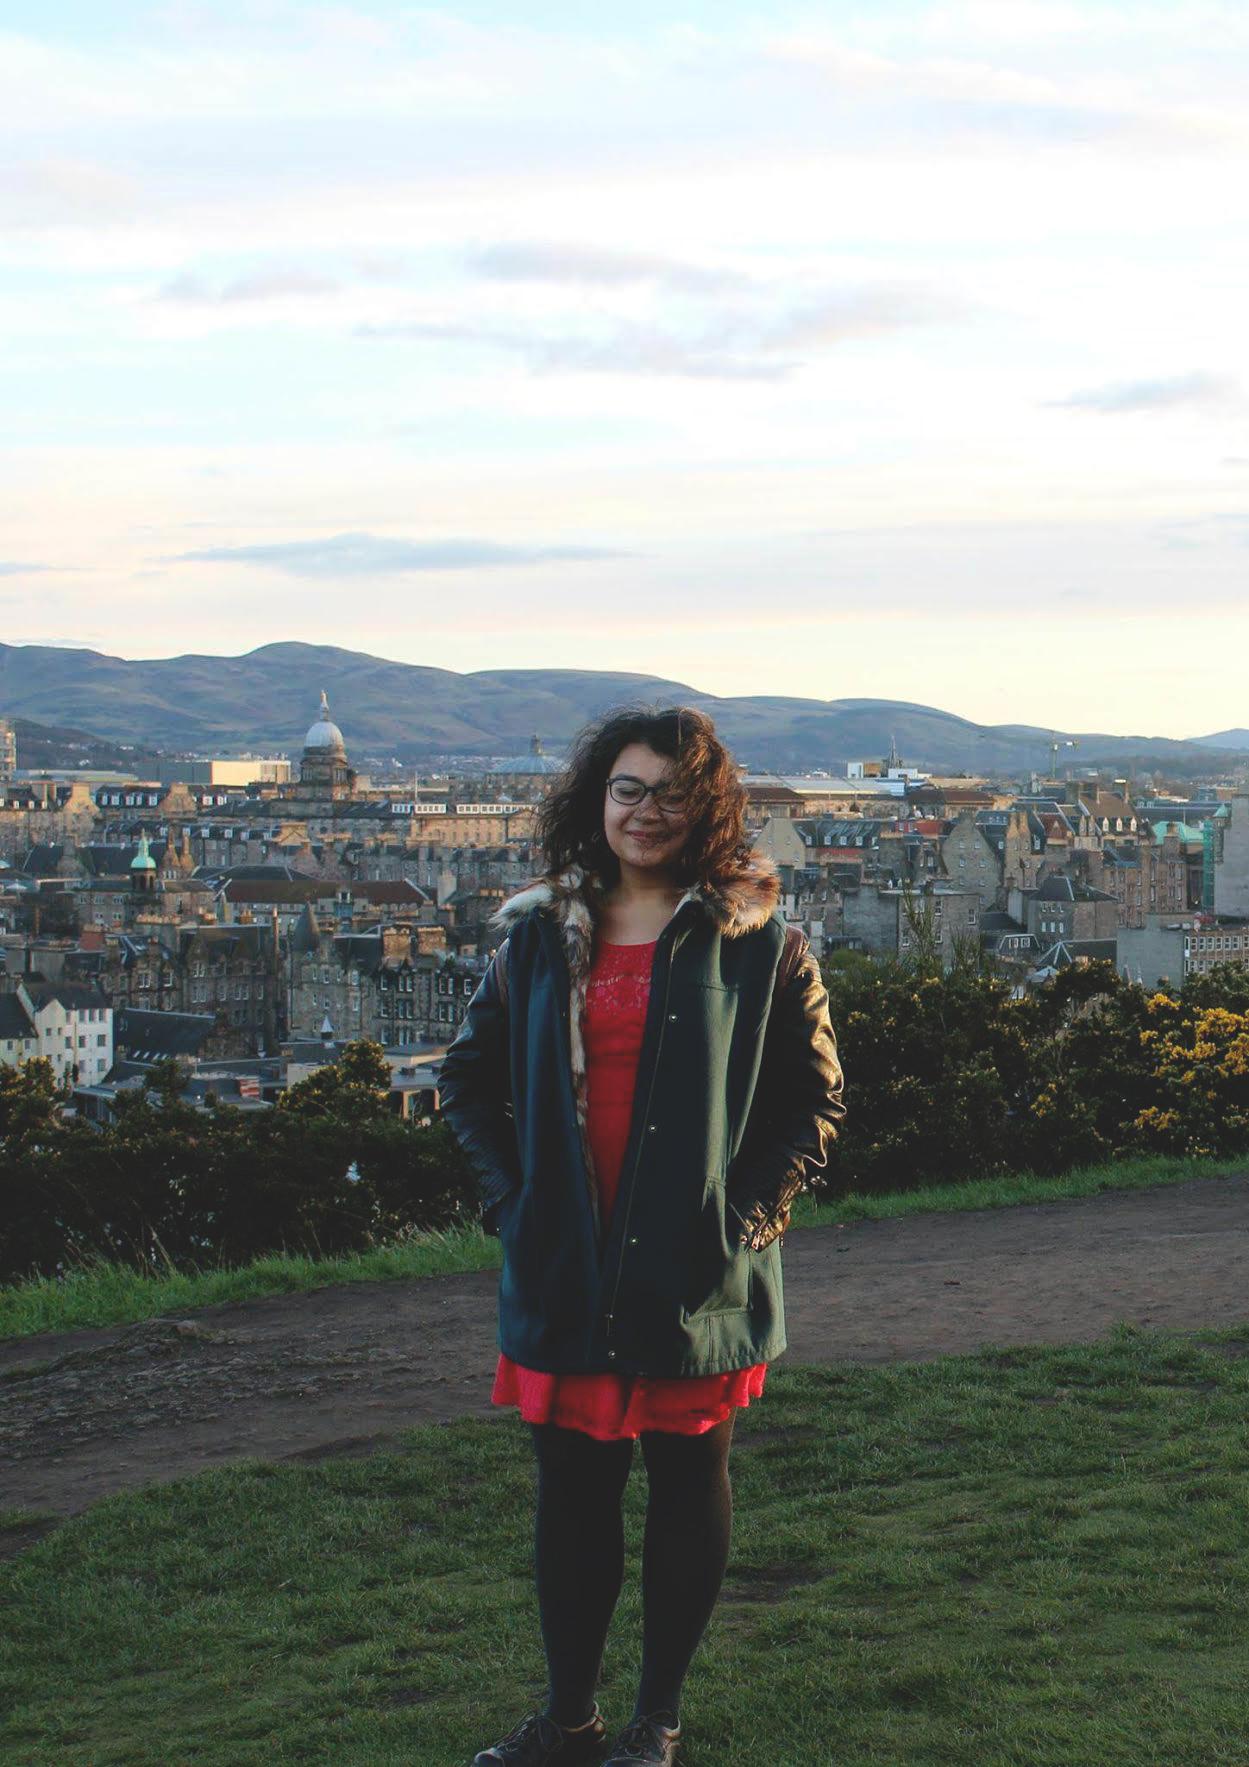 Ayesha Raees in the UK